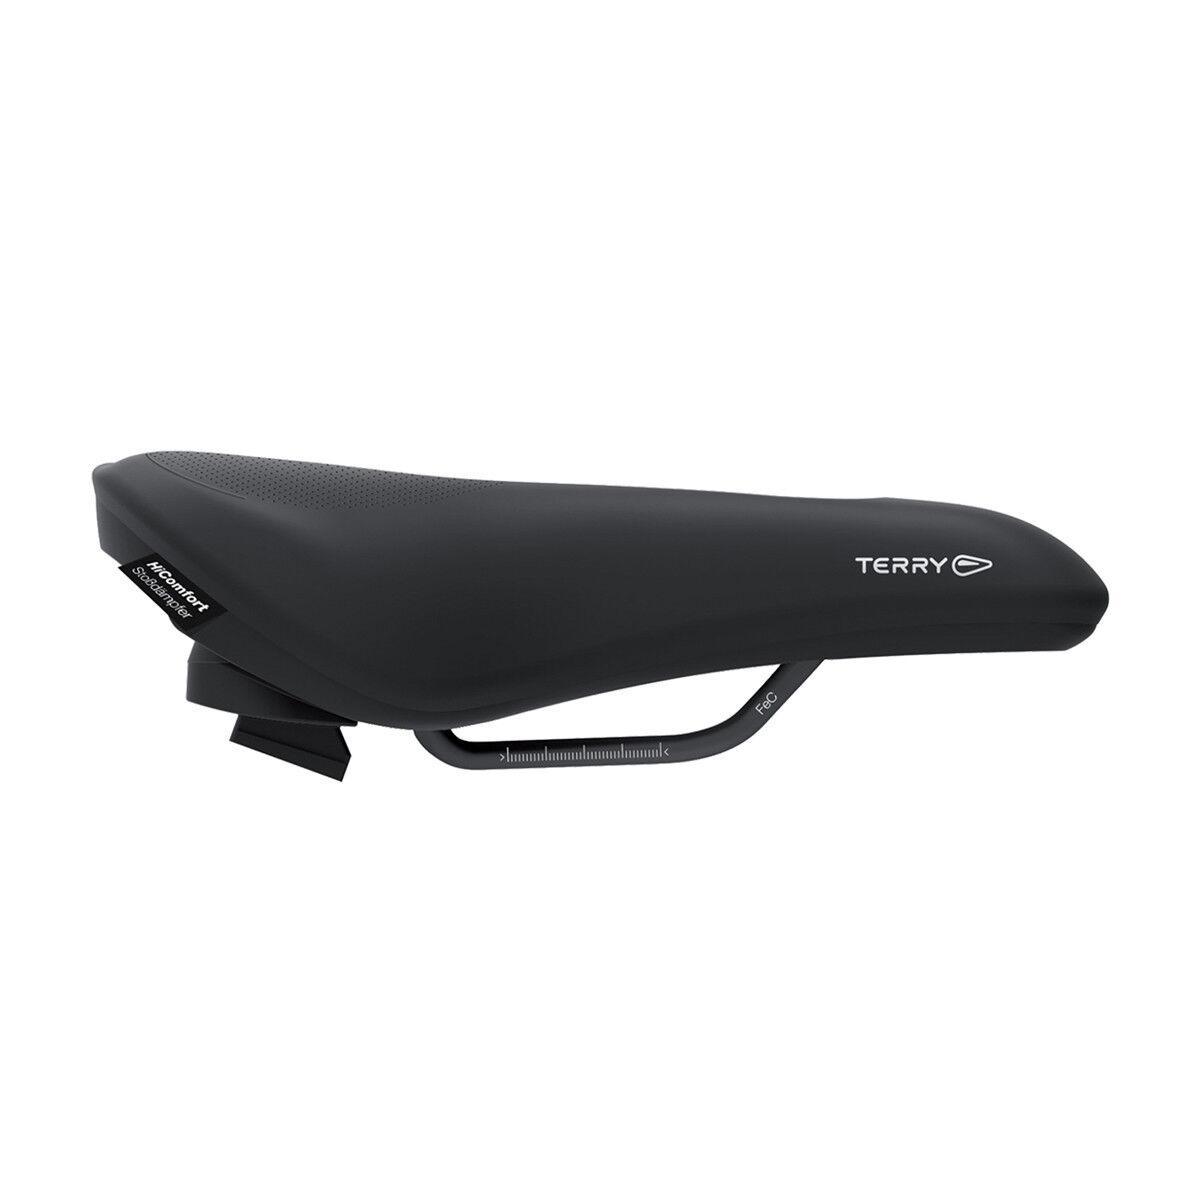 Terry Fisio Flex Gel damen Comfort Damen Trekking Fahrrad Sattel schwarz